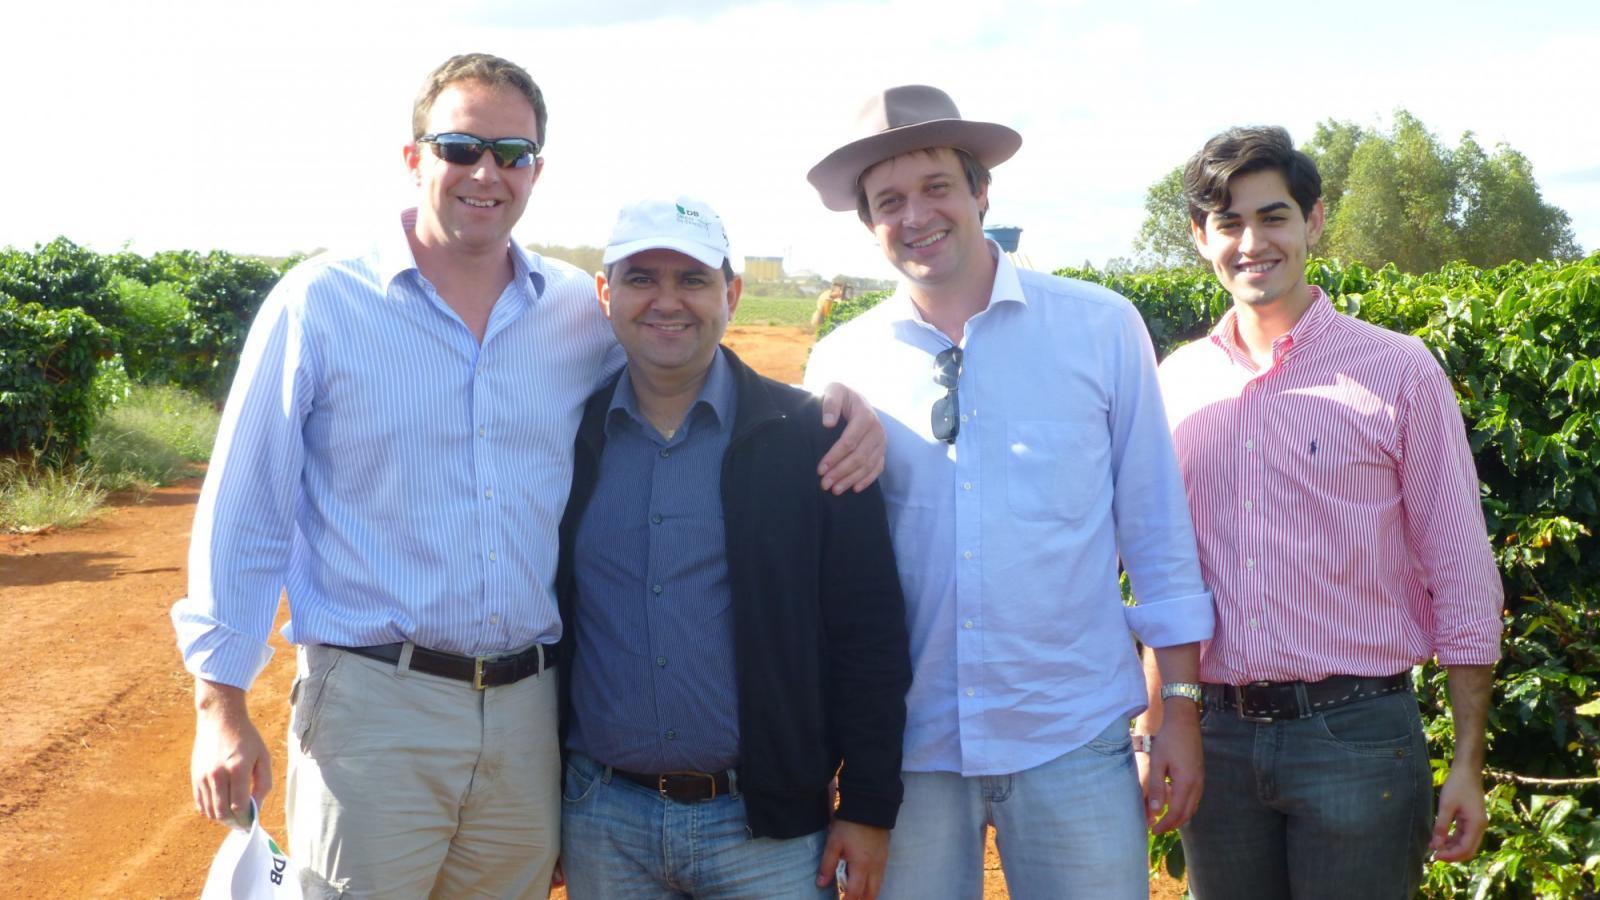 Lincoln & York Brazil origin trip 2013